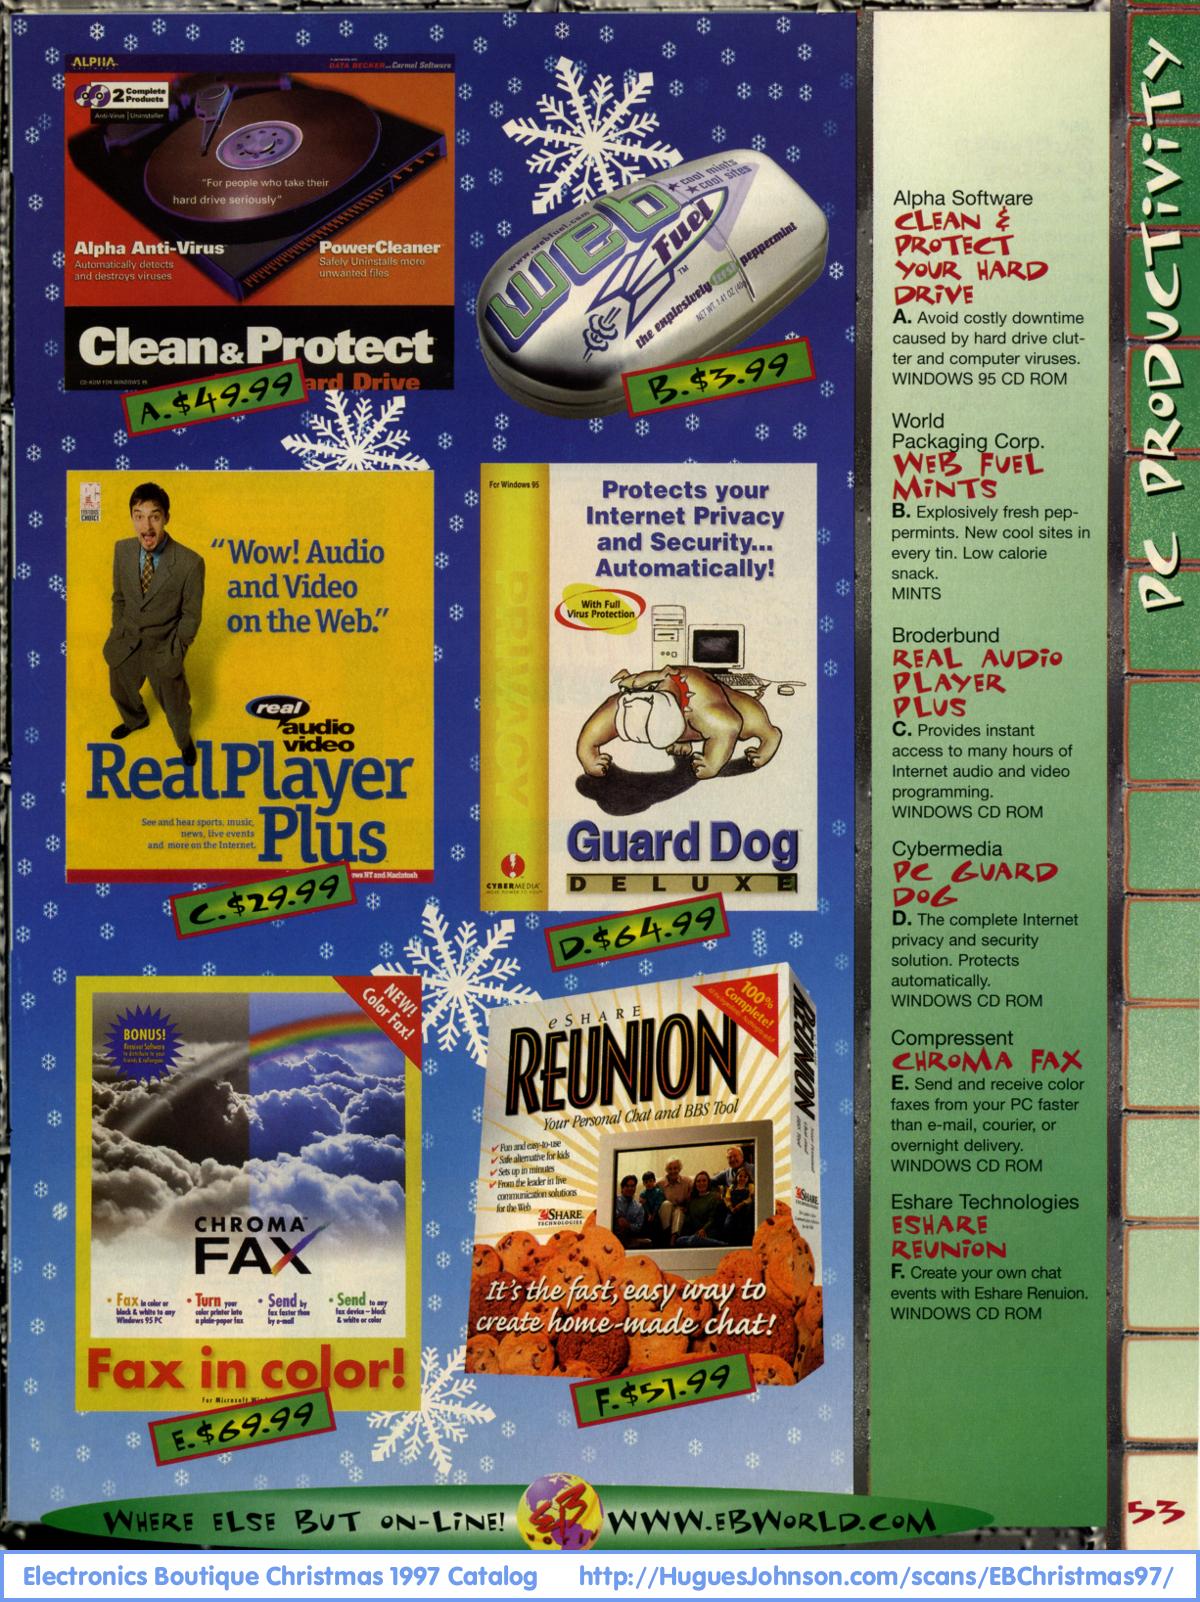 HuguesJohnson com - Electronics Boutique Christmas 1997 Catalog